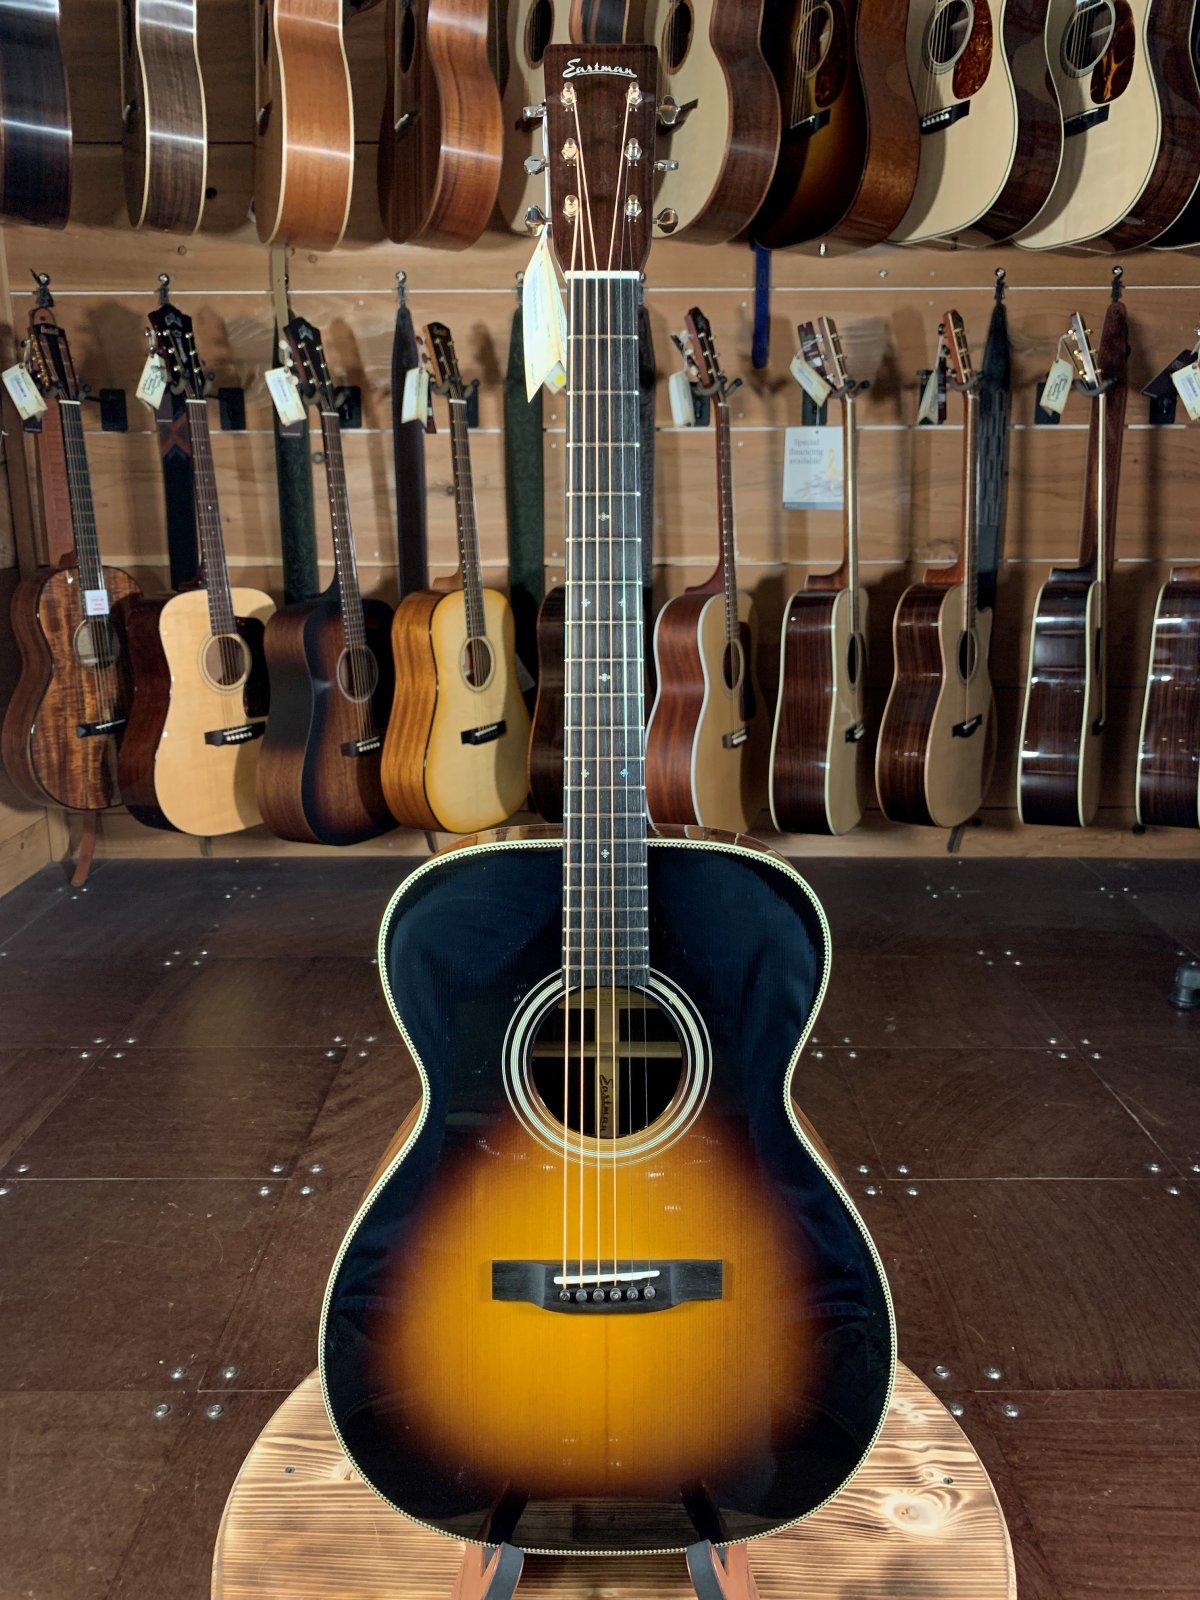 Eastman E20OM-SB Traditional Rosewood Sunburst Acoustic Guitar #5031